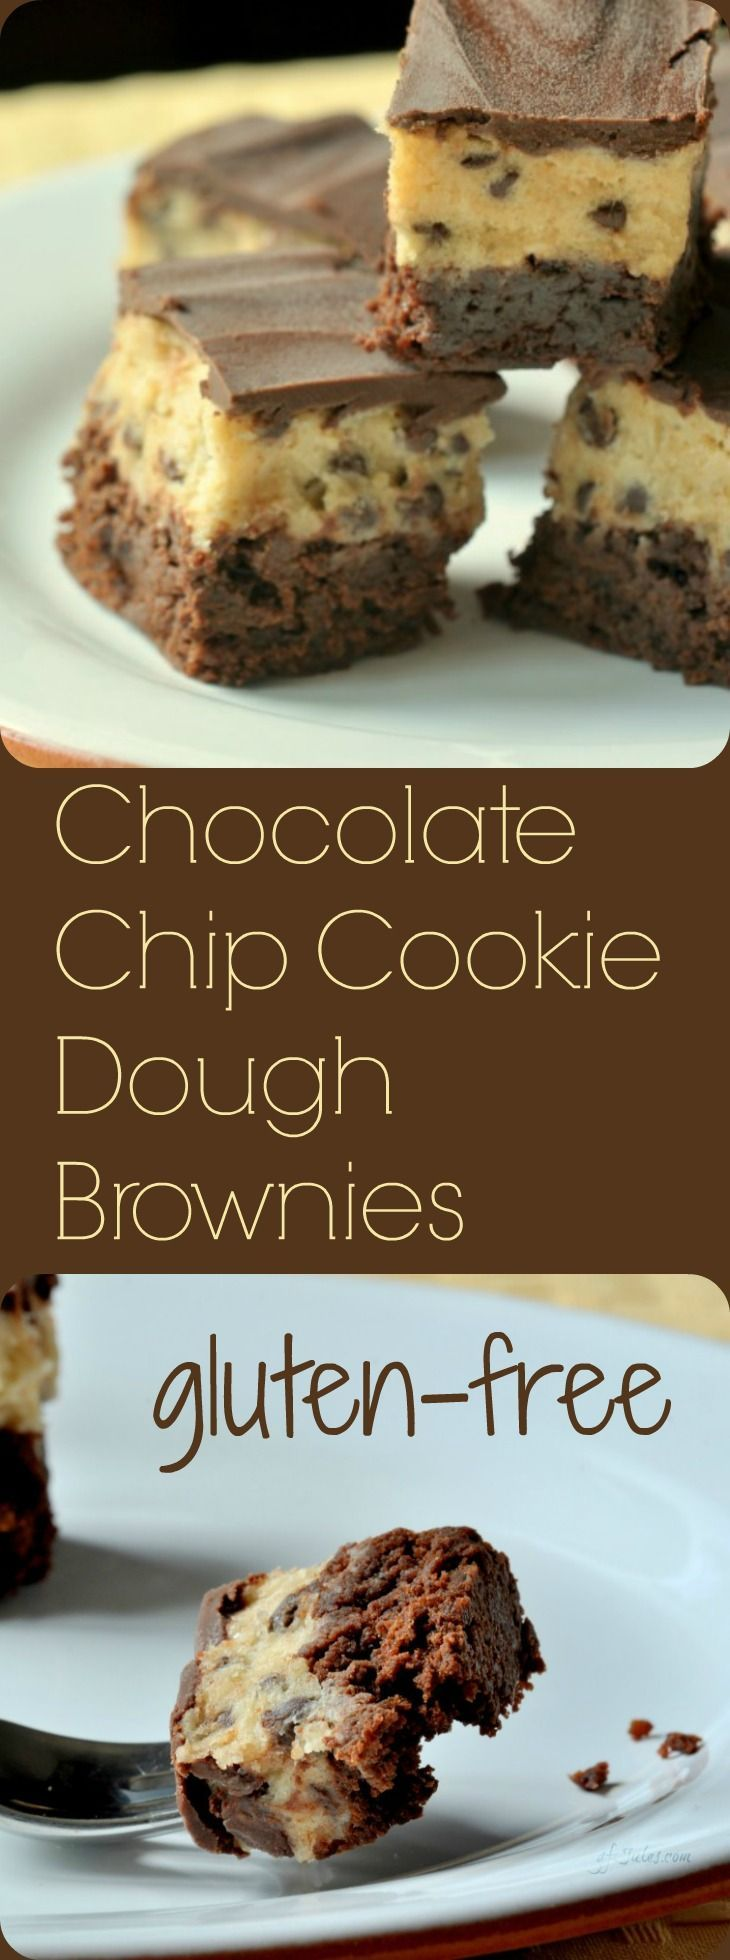 Gluten free chocolate chip cookie dough brownies recipe